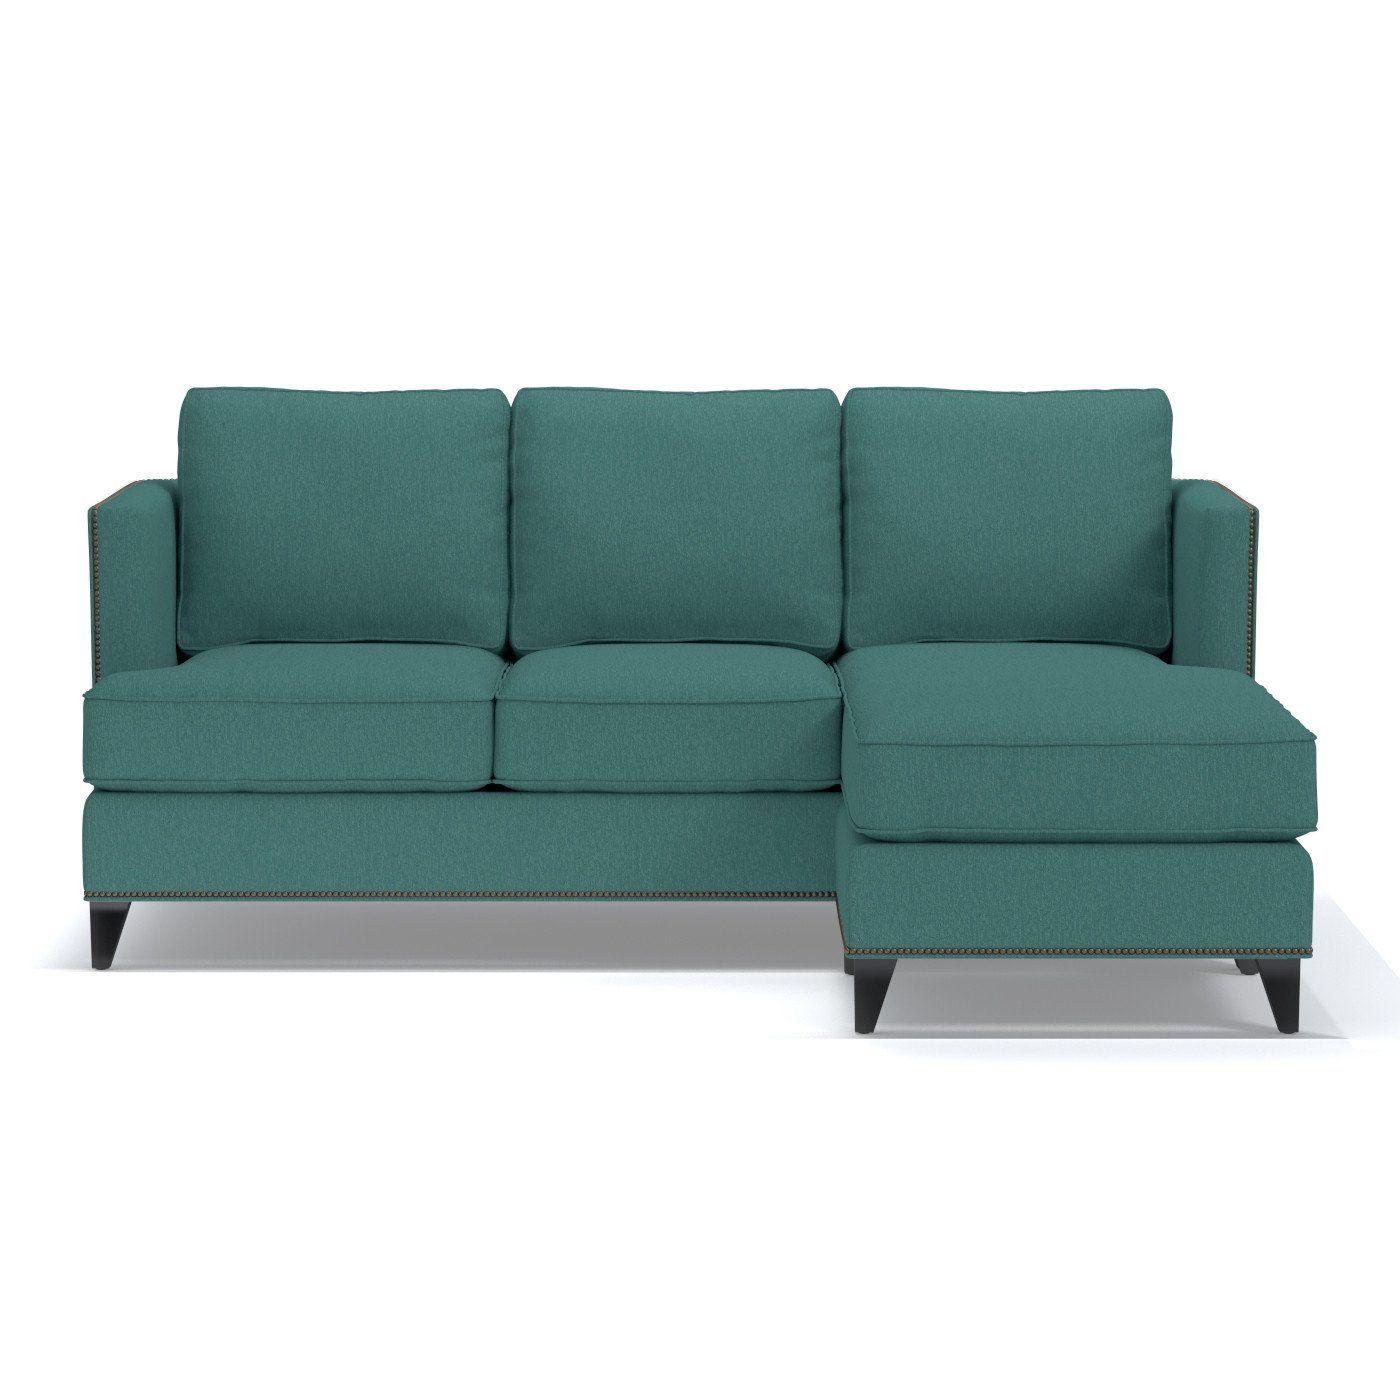 Osborne Reversible Chaise Sofa Leg Finish Pecan Products